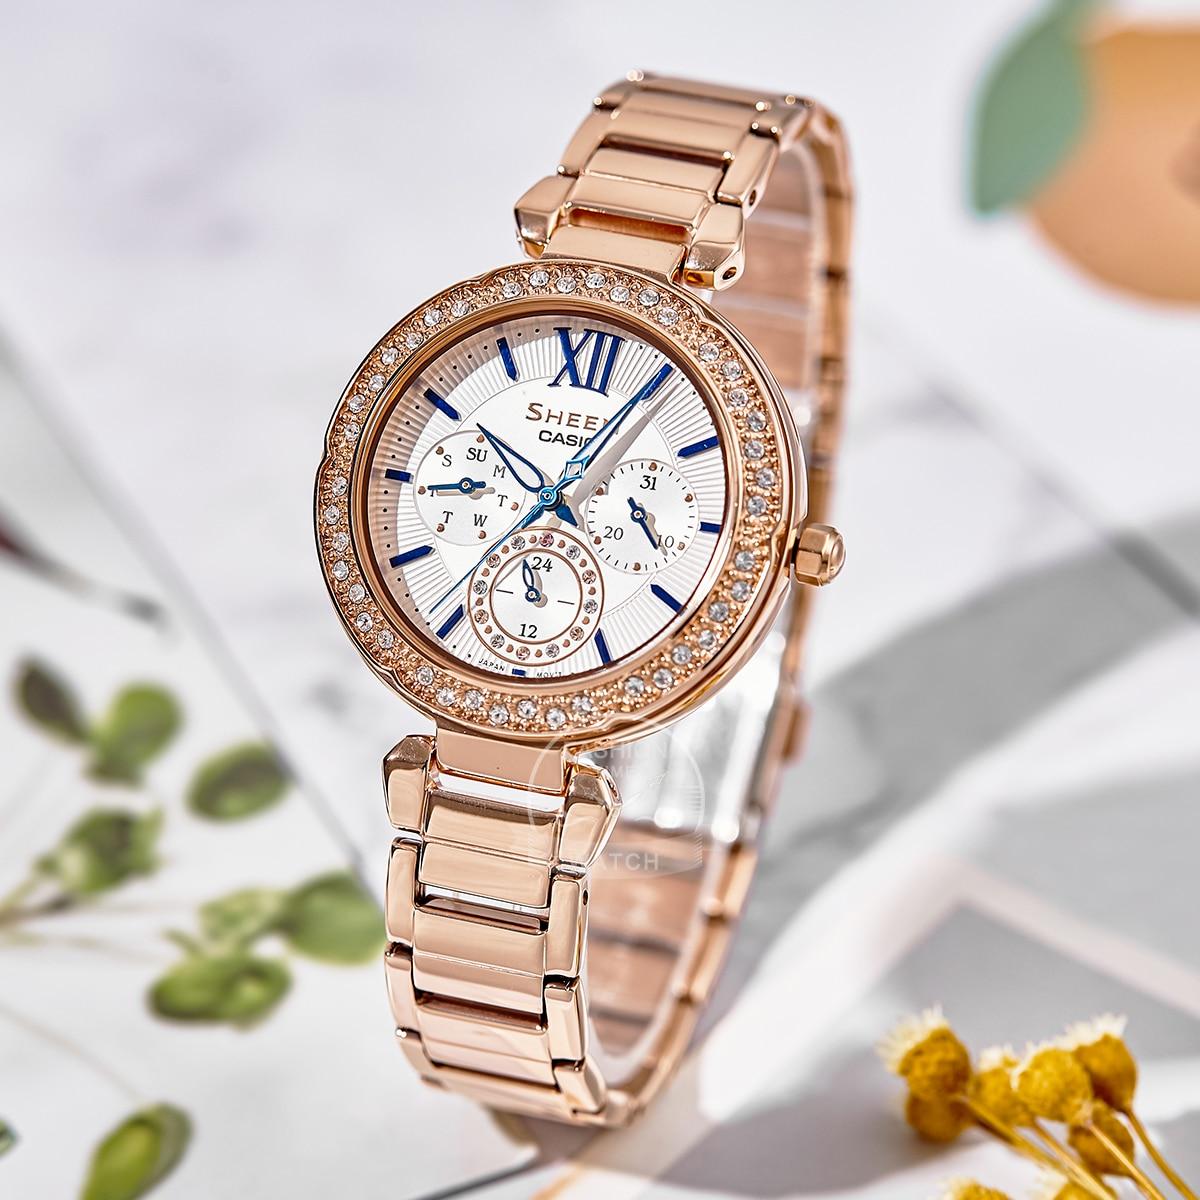 Casio watch Swarovski Crystal women watches fashion top brand luxury set ladies watch women Quartz Sport clock reloj mujer enlarge